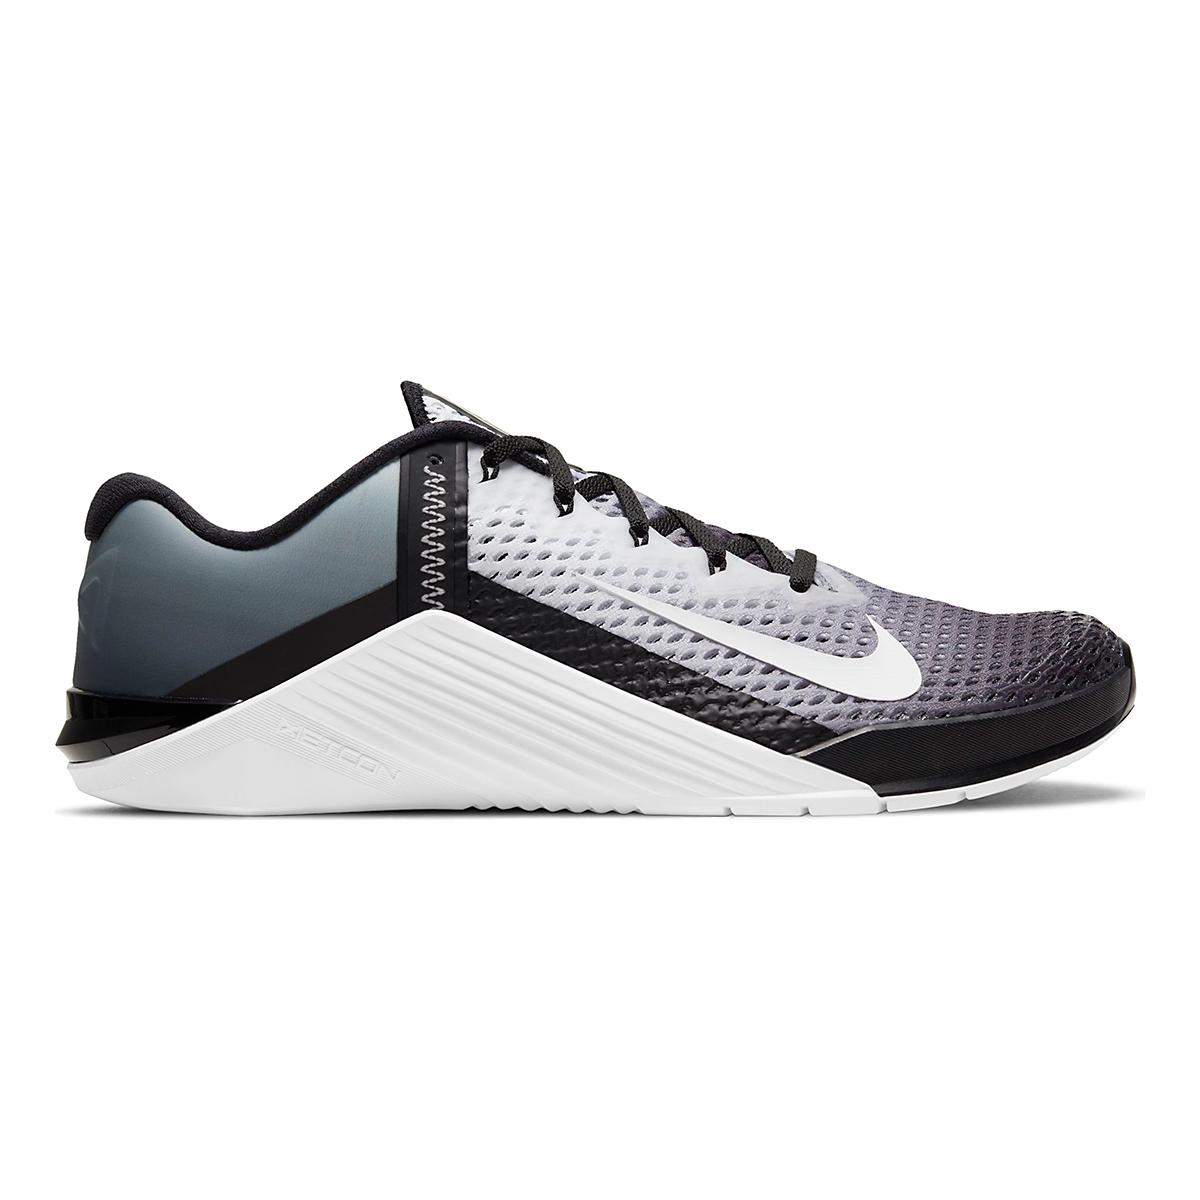 Men's Nike Metcon 6 Training Shoe - Color: Black/White - Size: 4 - Width: Regular, Black/White, large, image 1